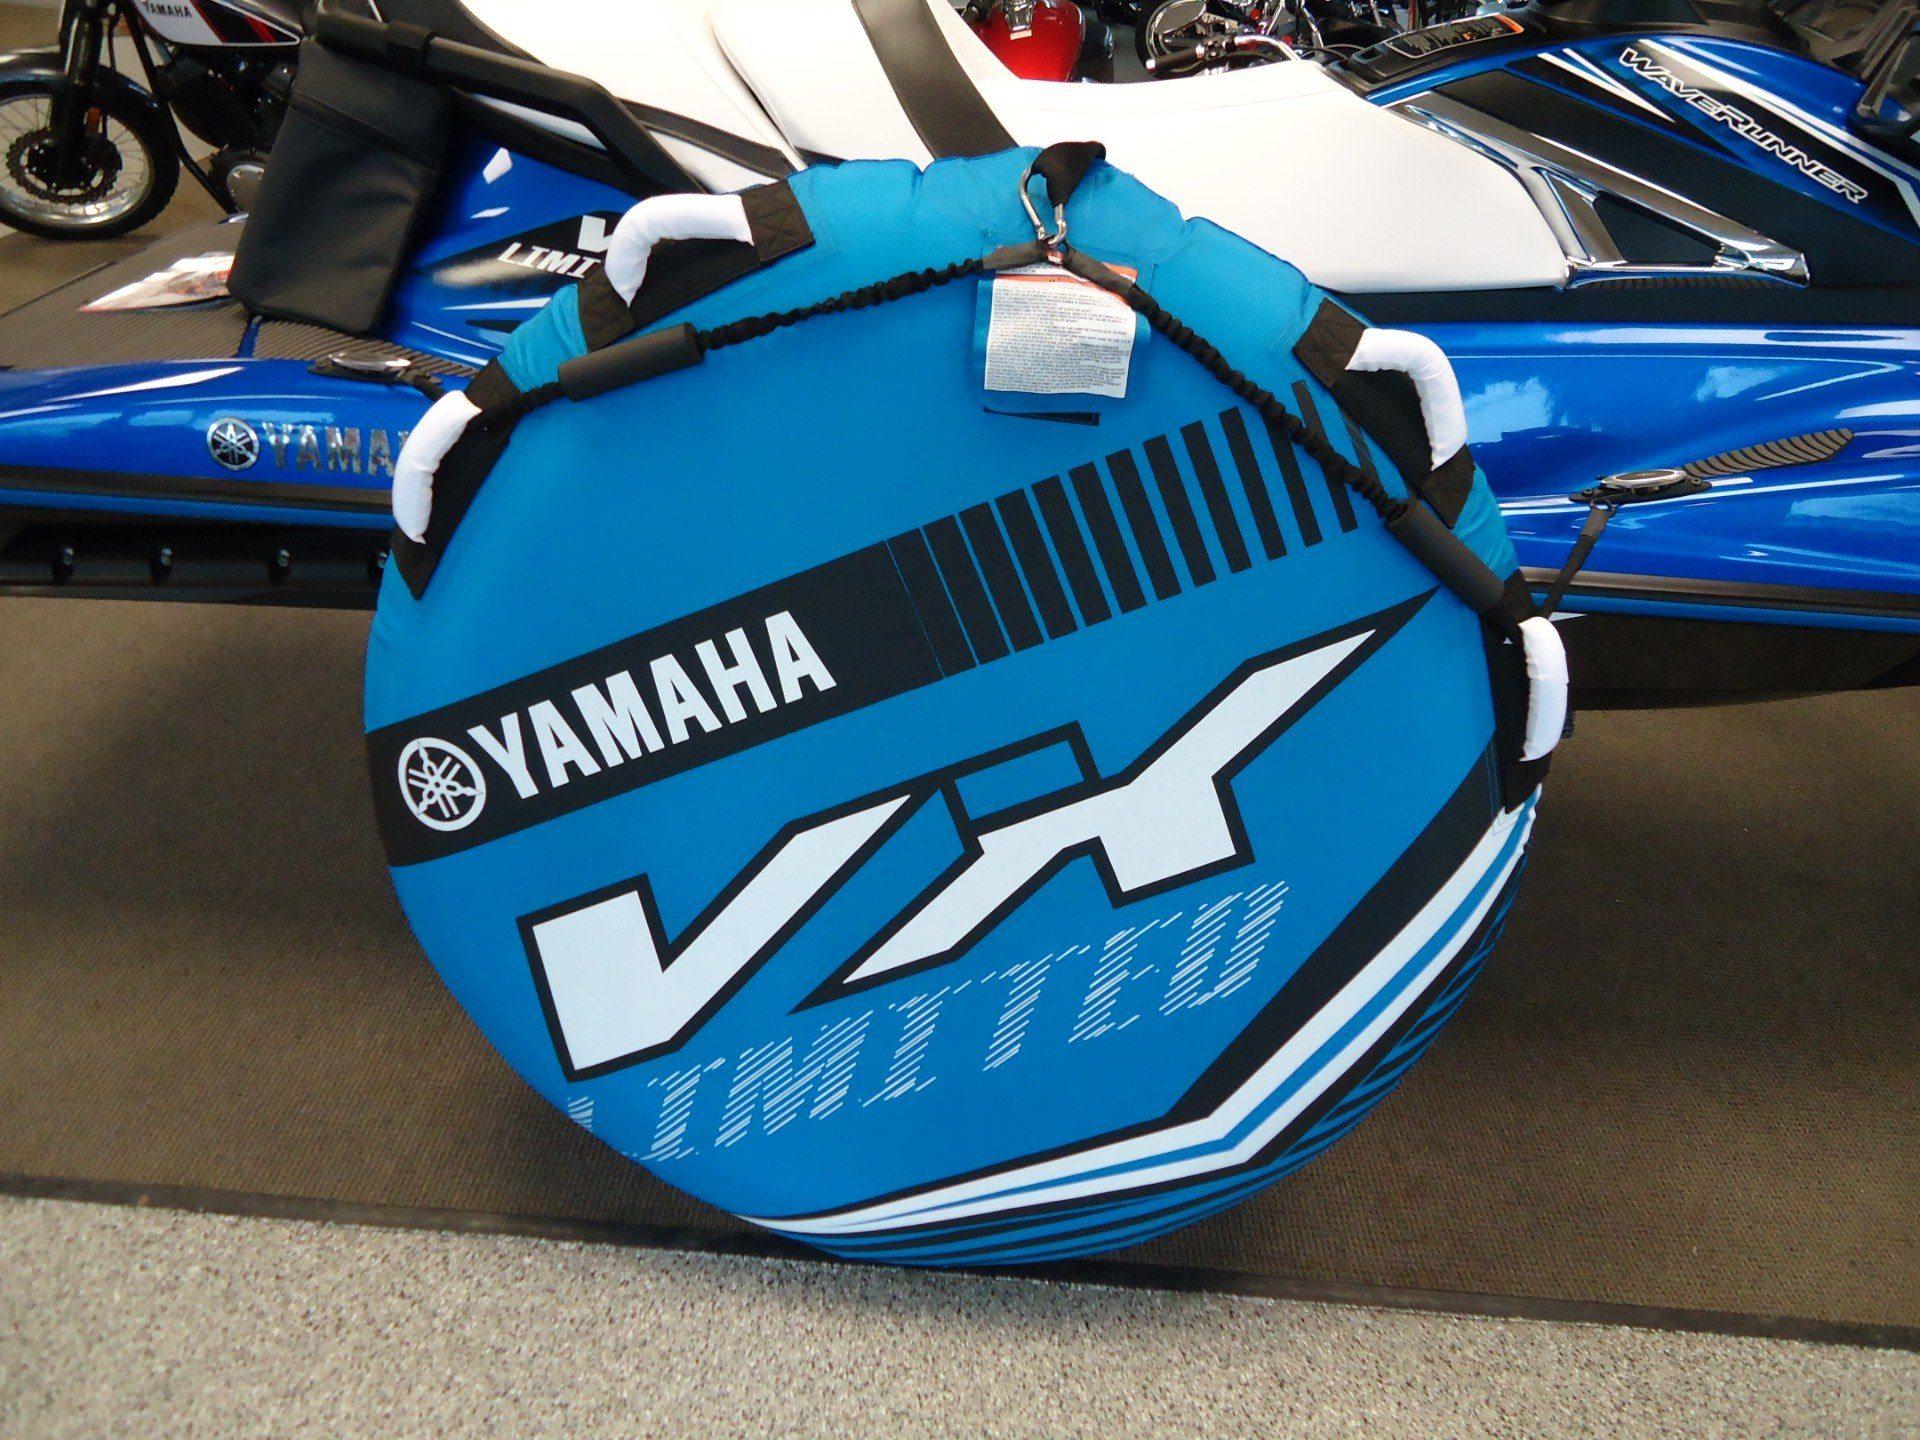 2017 Yamaha VX Limited 12